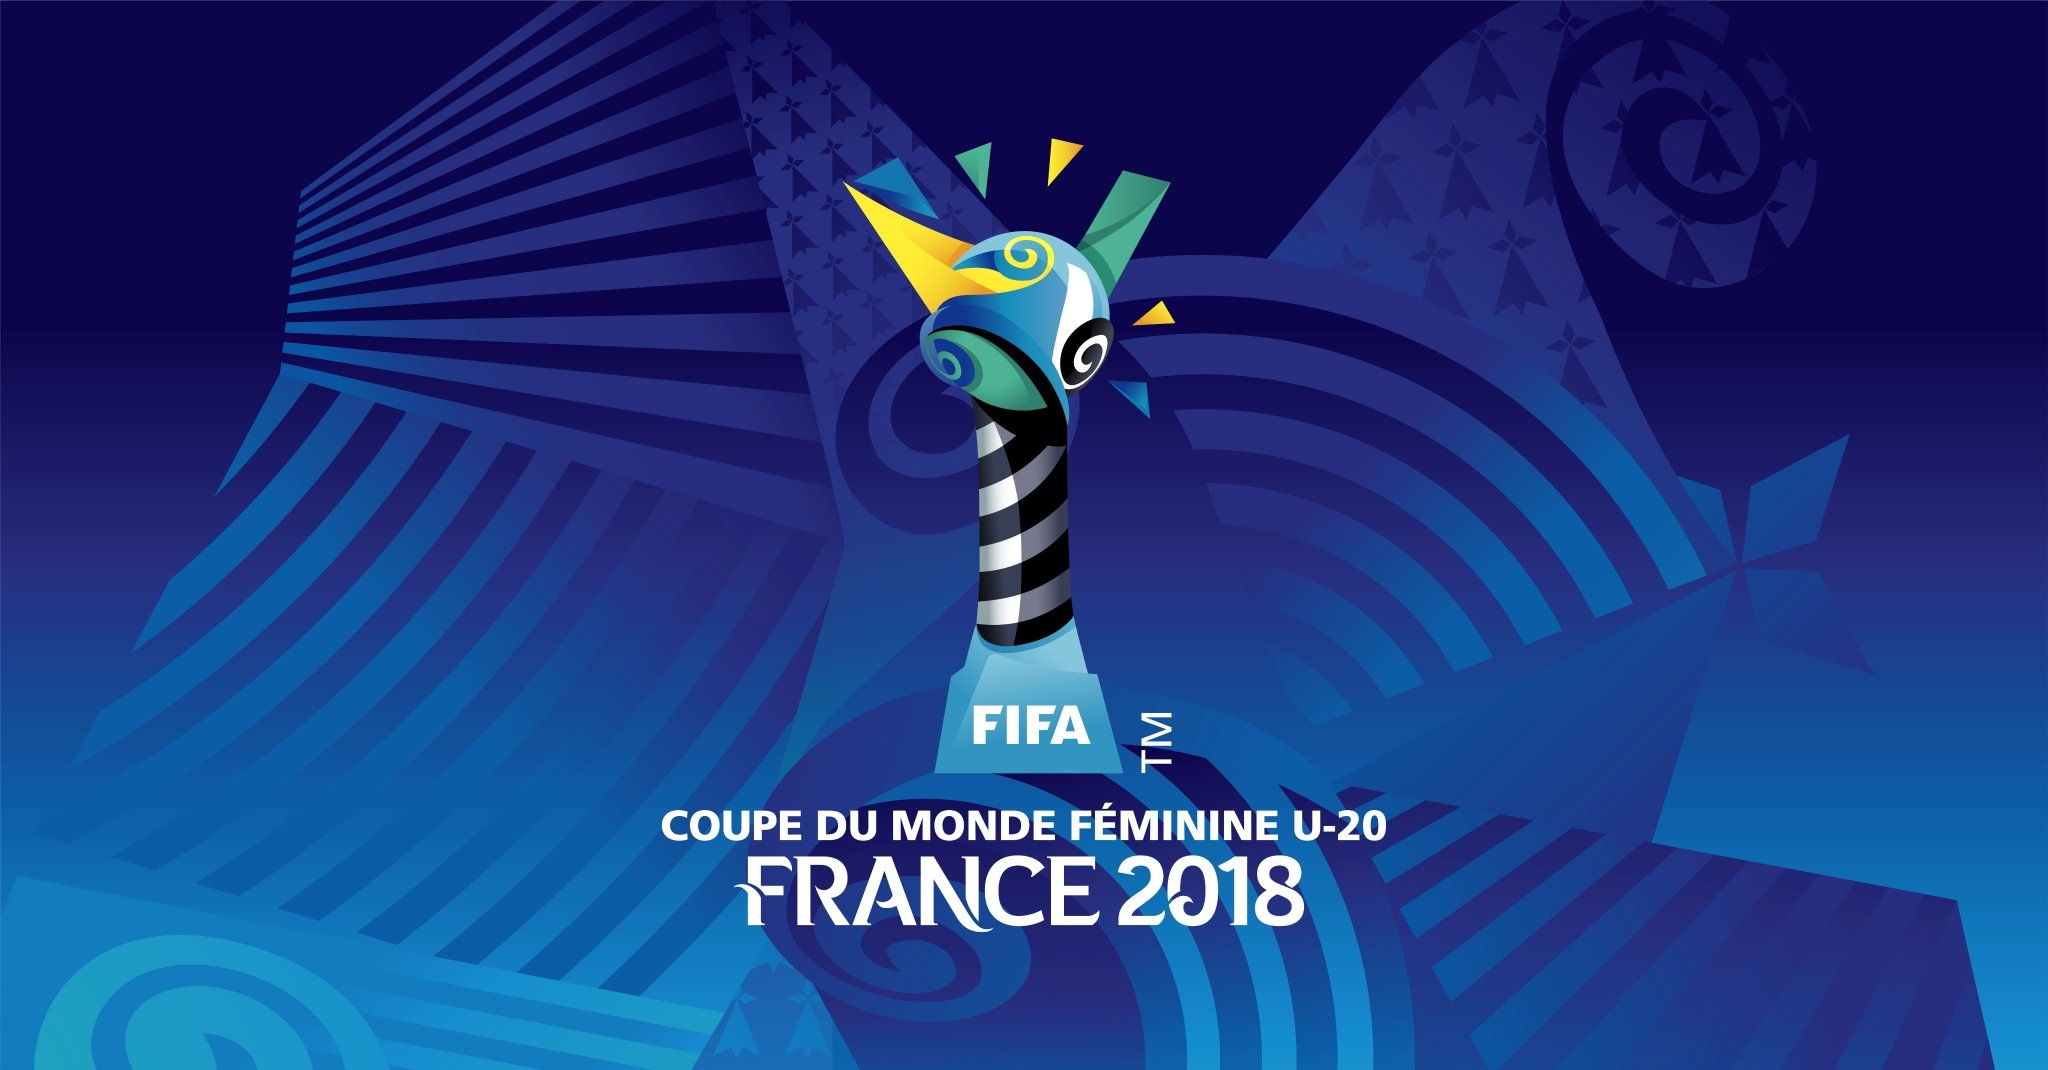 F minines ligue bretagne de football - Coupe du monde feminine 2014 ...